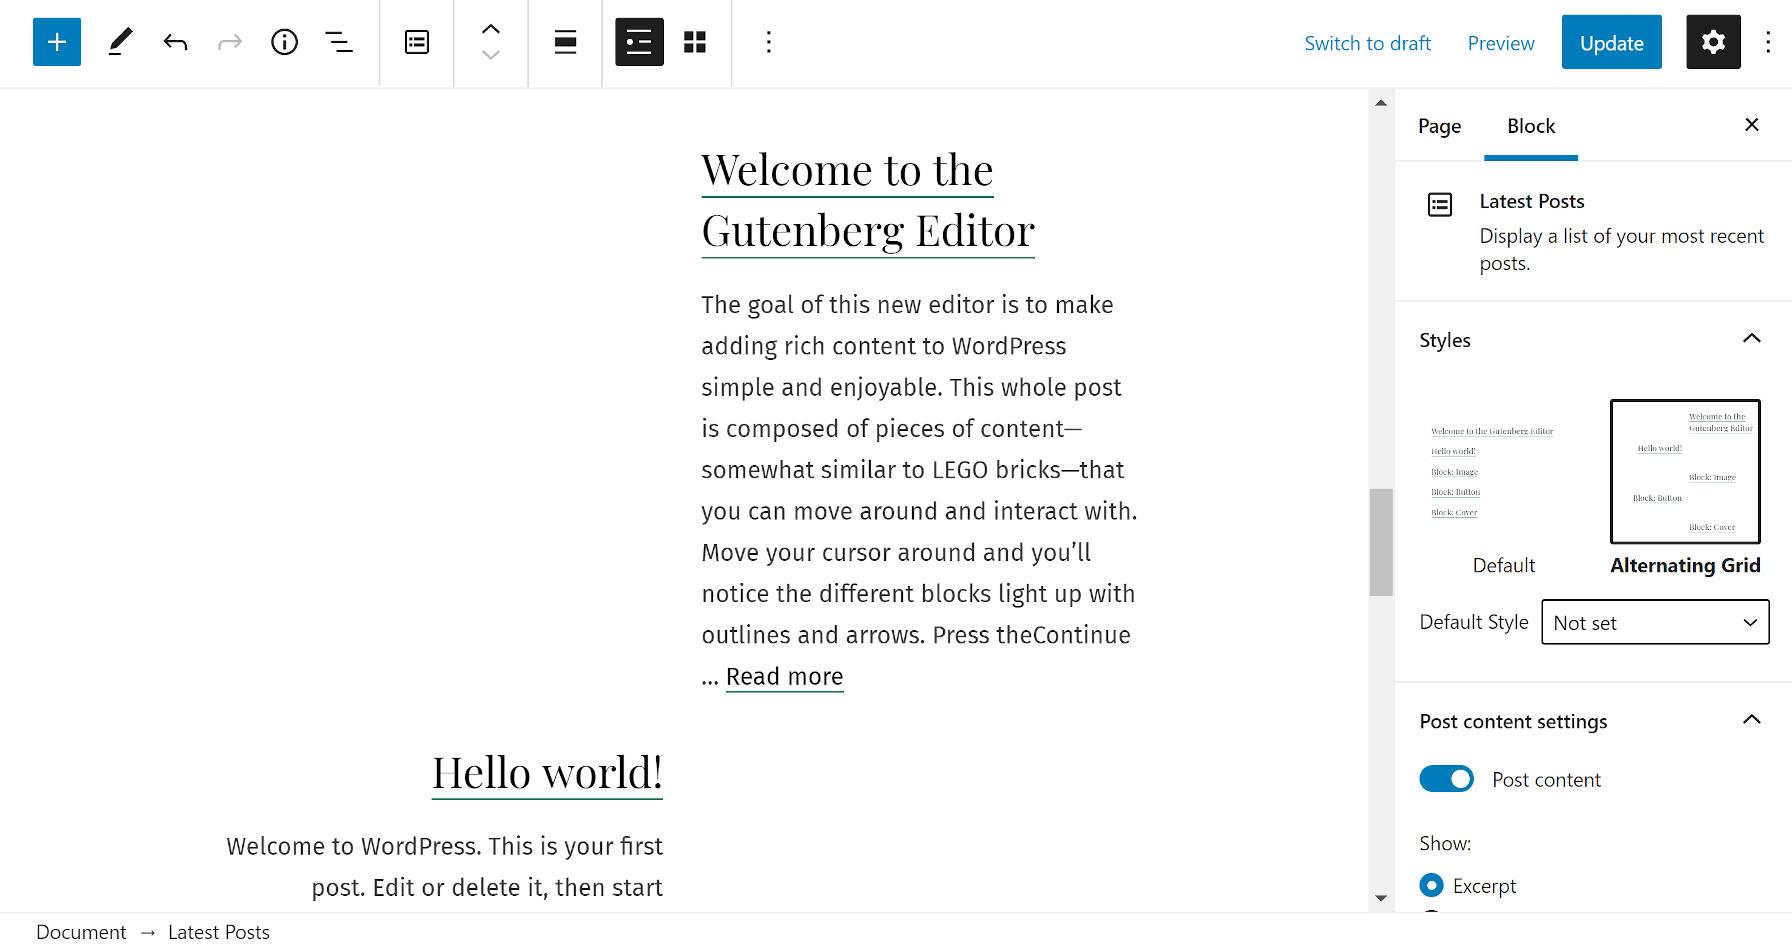 Explore-seedlet-automattics-block-first-wordpress-theme-3探索Seedlet,Automattic的Block-first WordPress主题